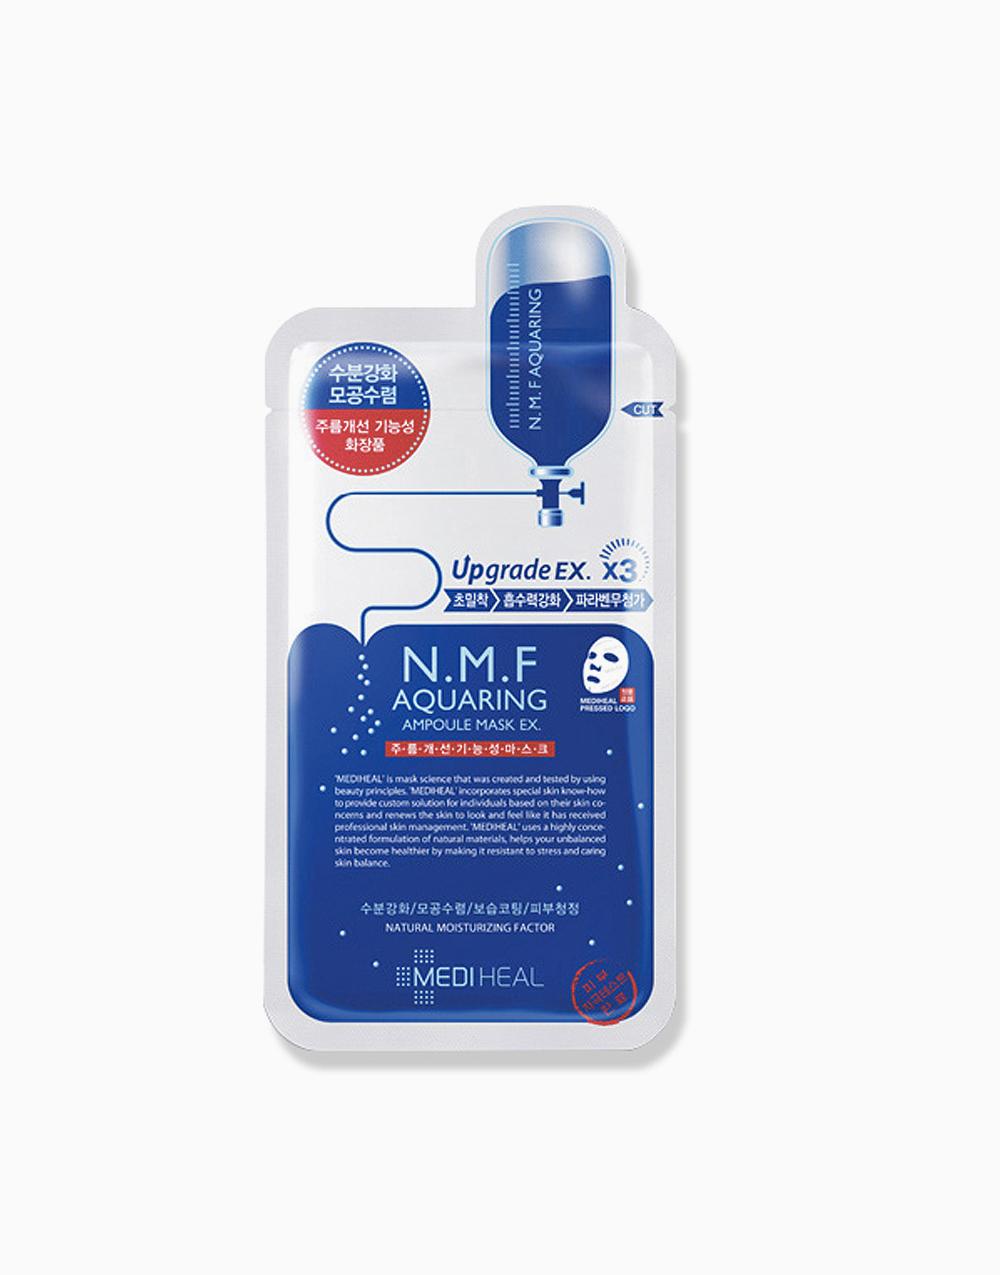 N.M.F Aquaring Moisturising Ampoule Mask EX (27ml) by Mediheal